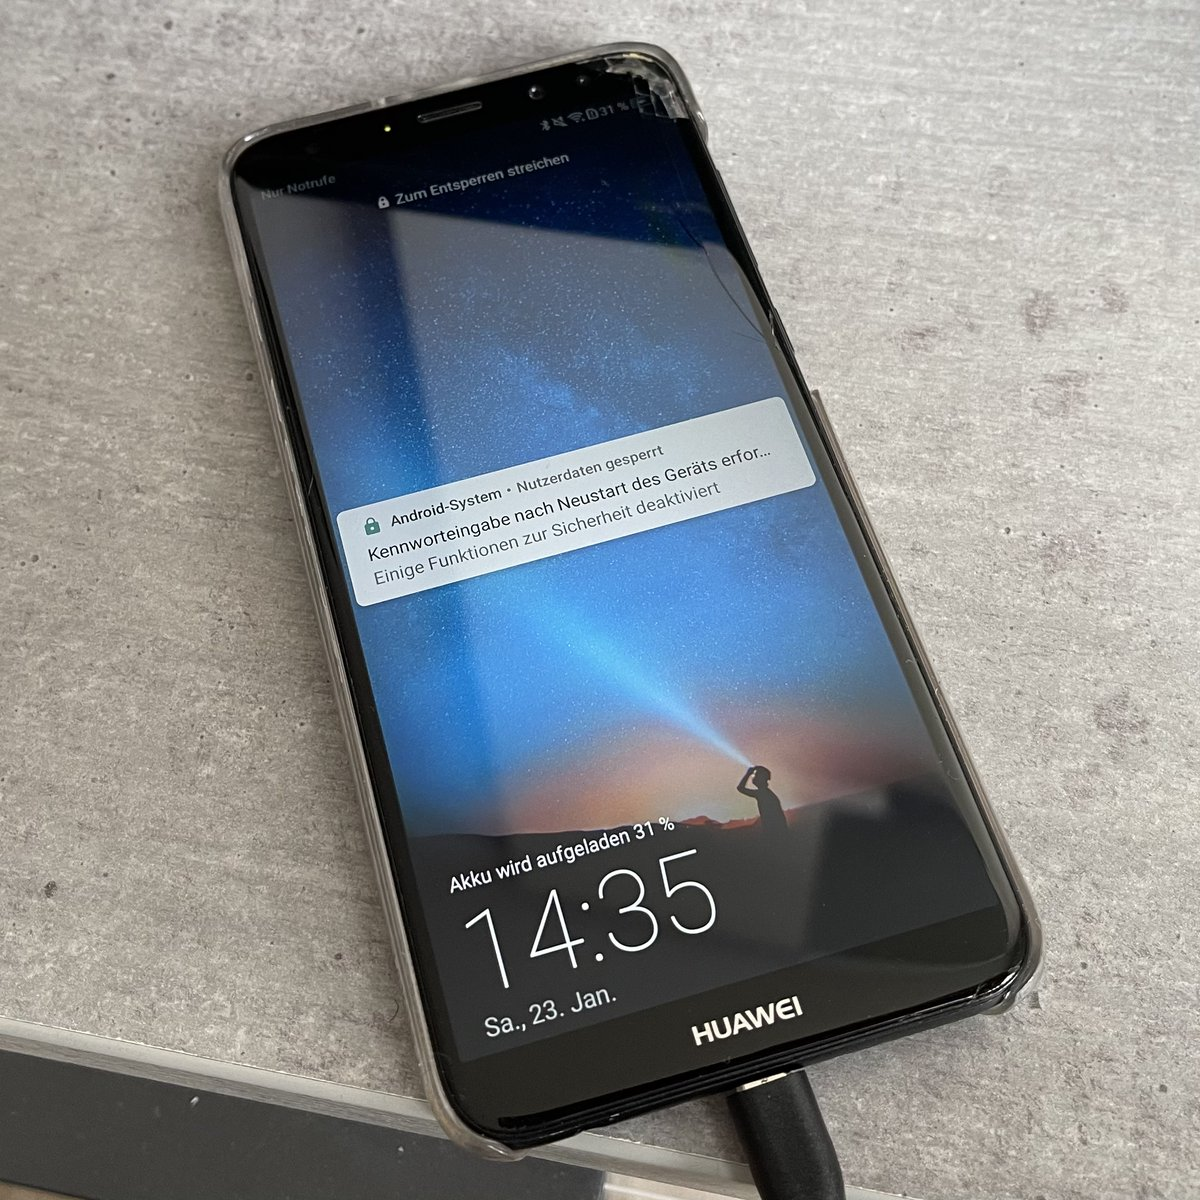 System nutzerdaten gesperrt android How to